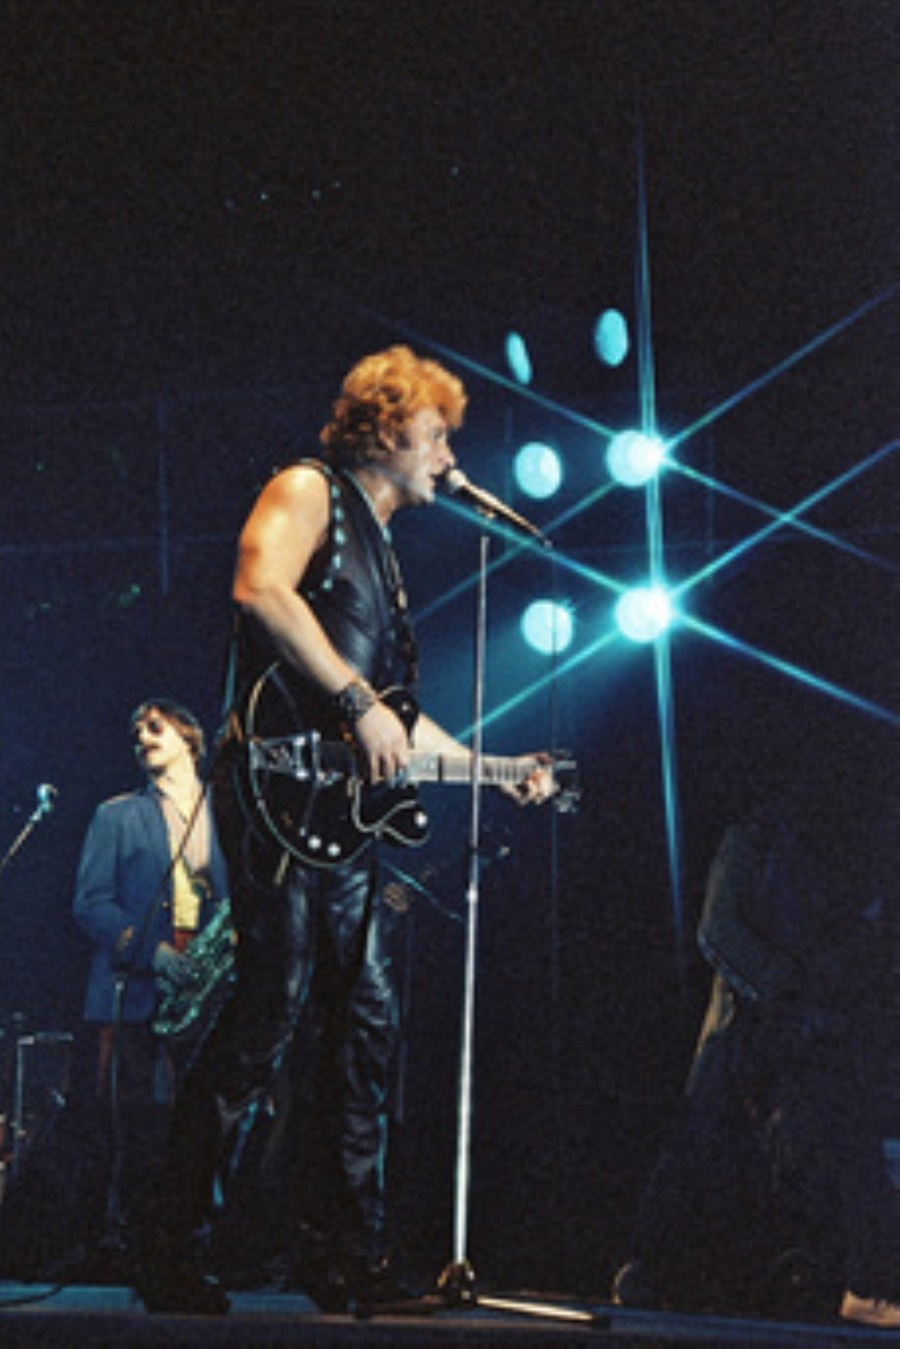 LES CONCERTS DE JOHNNY 'NANCY 1983' Akg77183